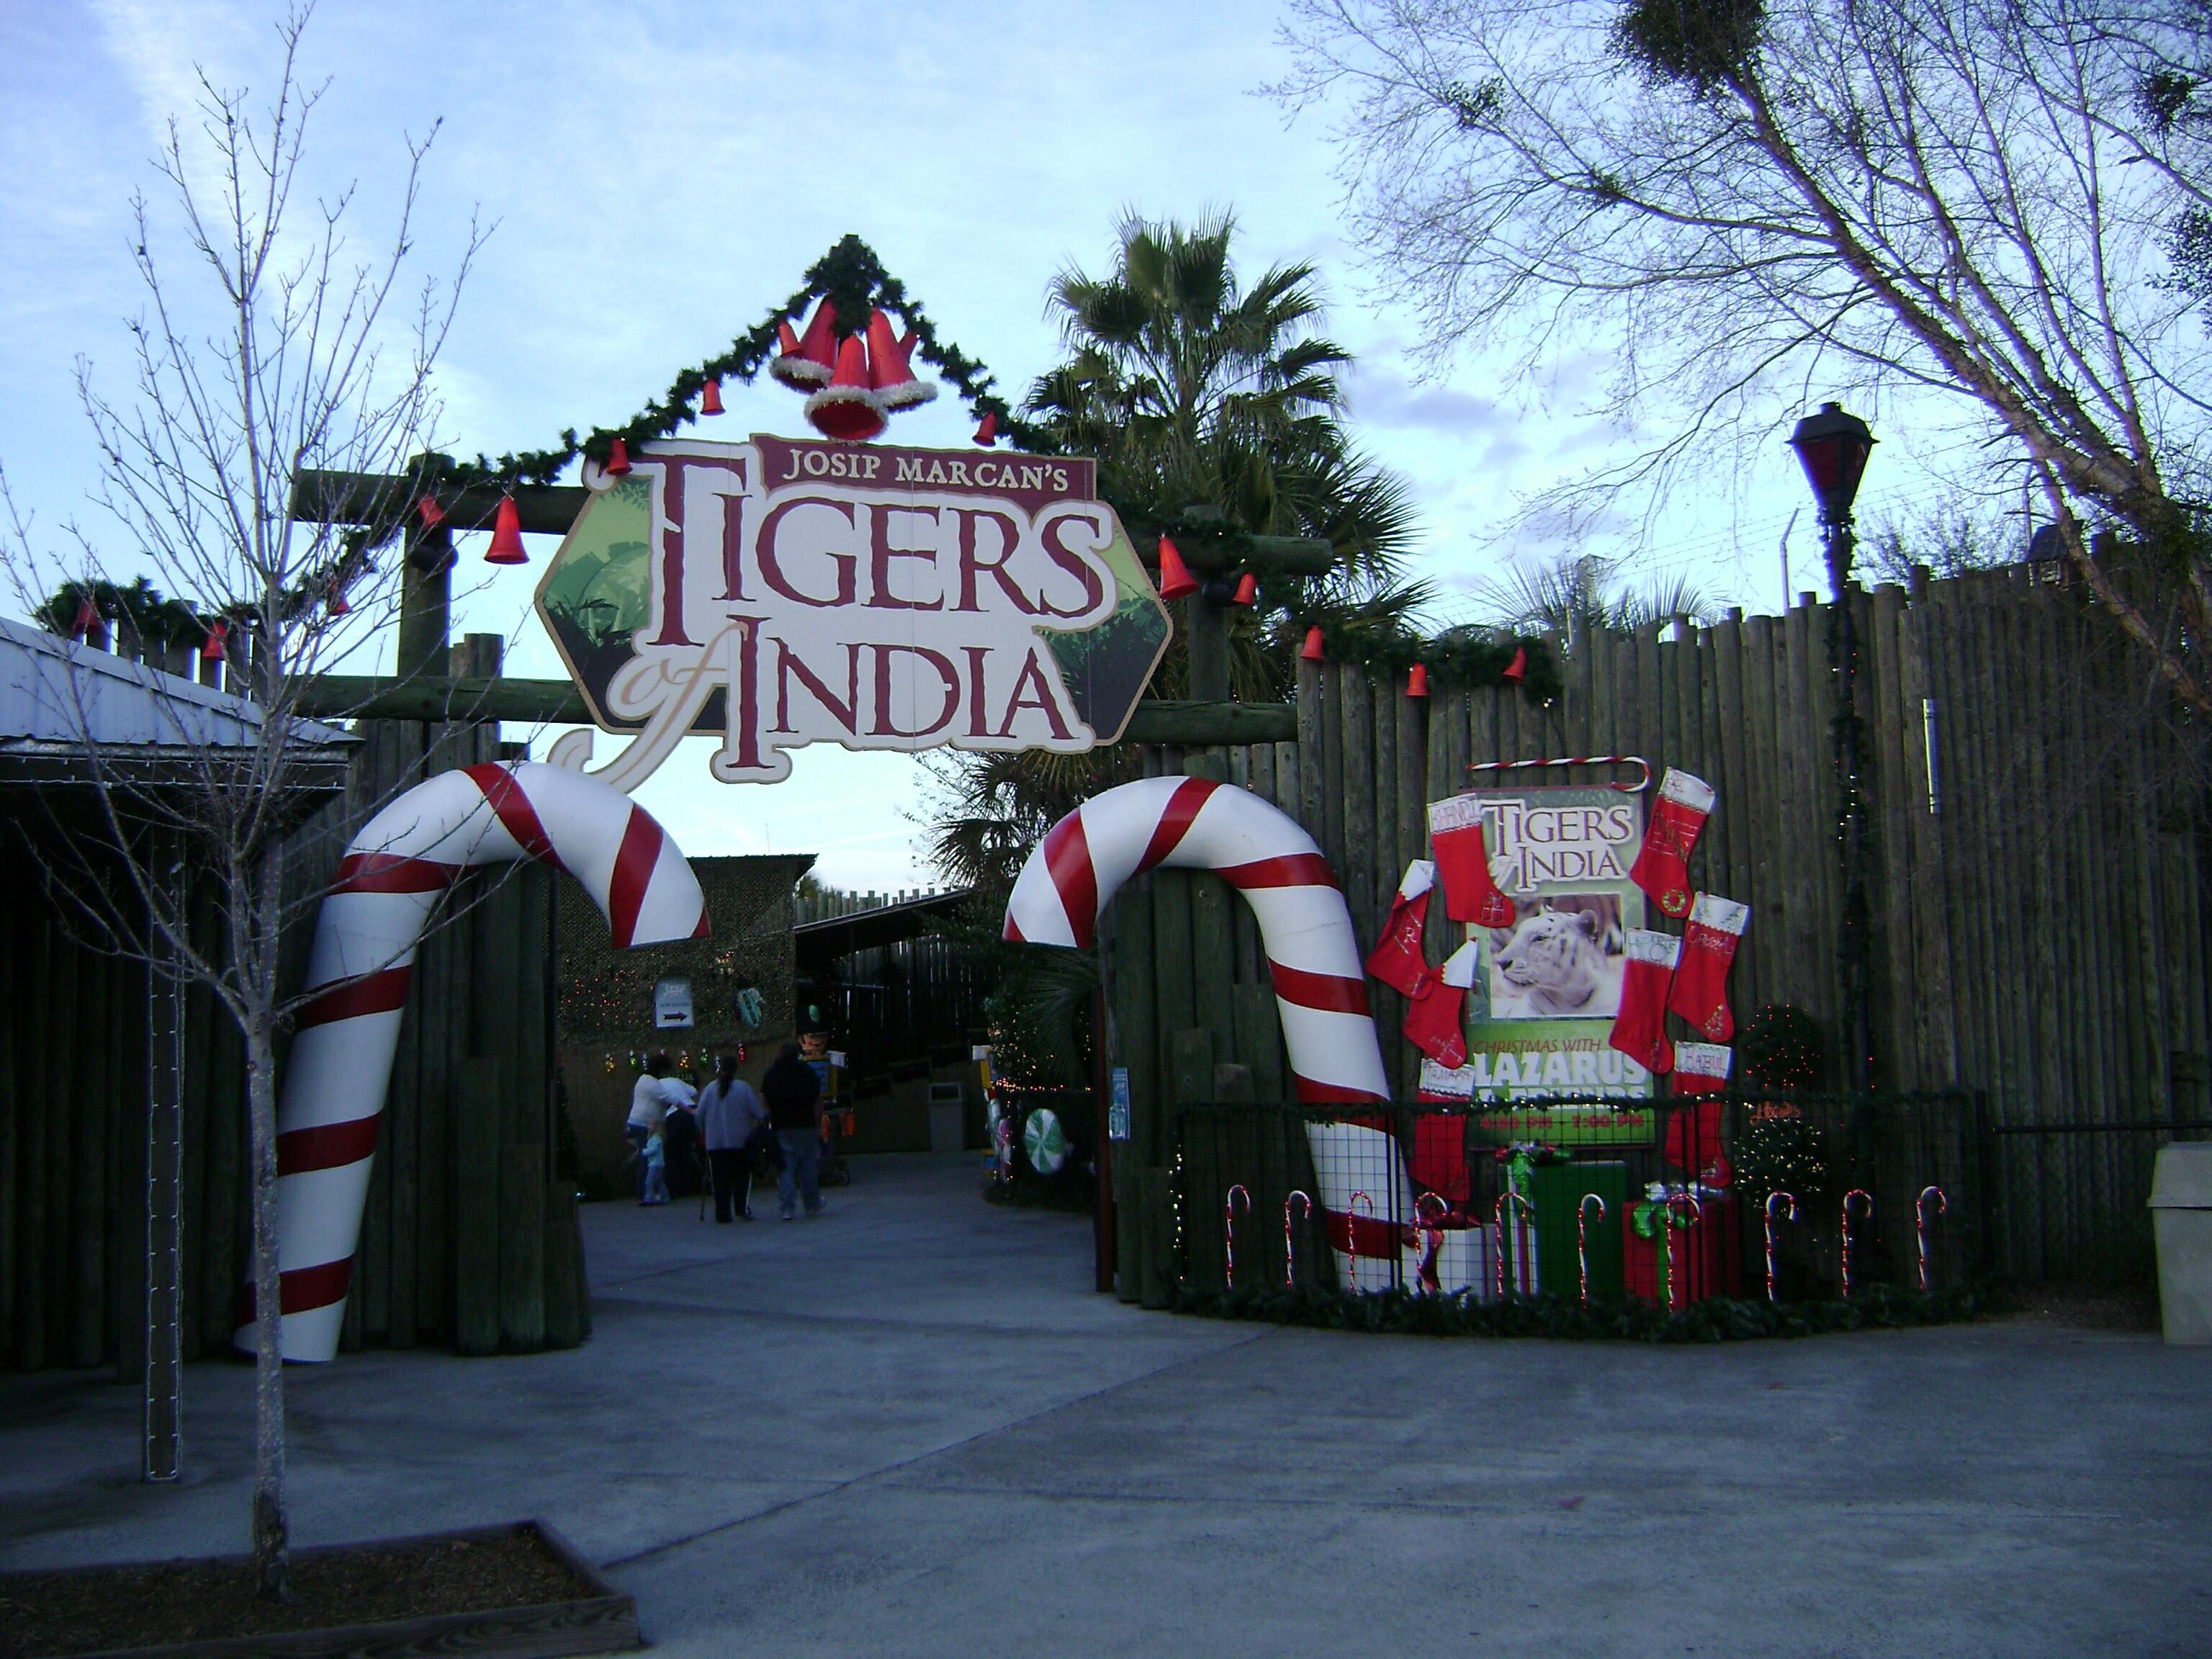 File:Wild Adventures Christmas Decorations 2.jpg - Wikimedia Commons